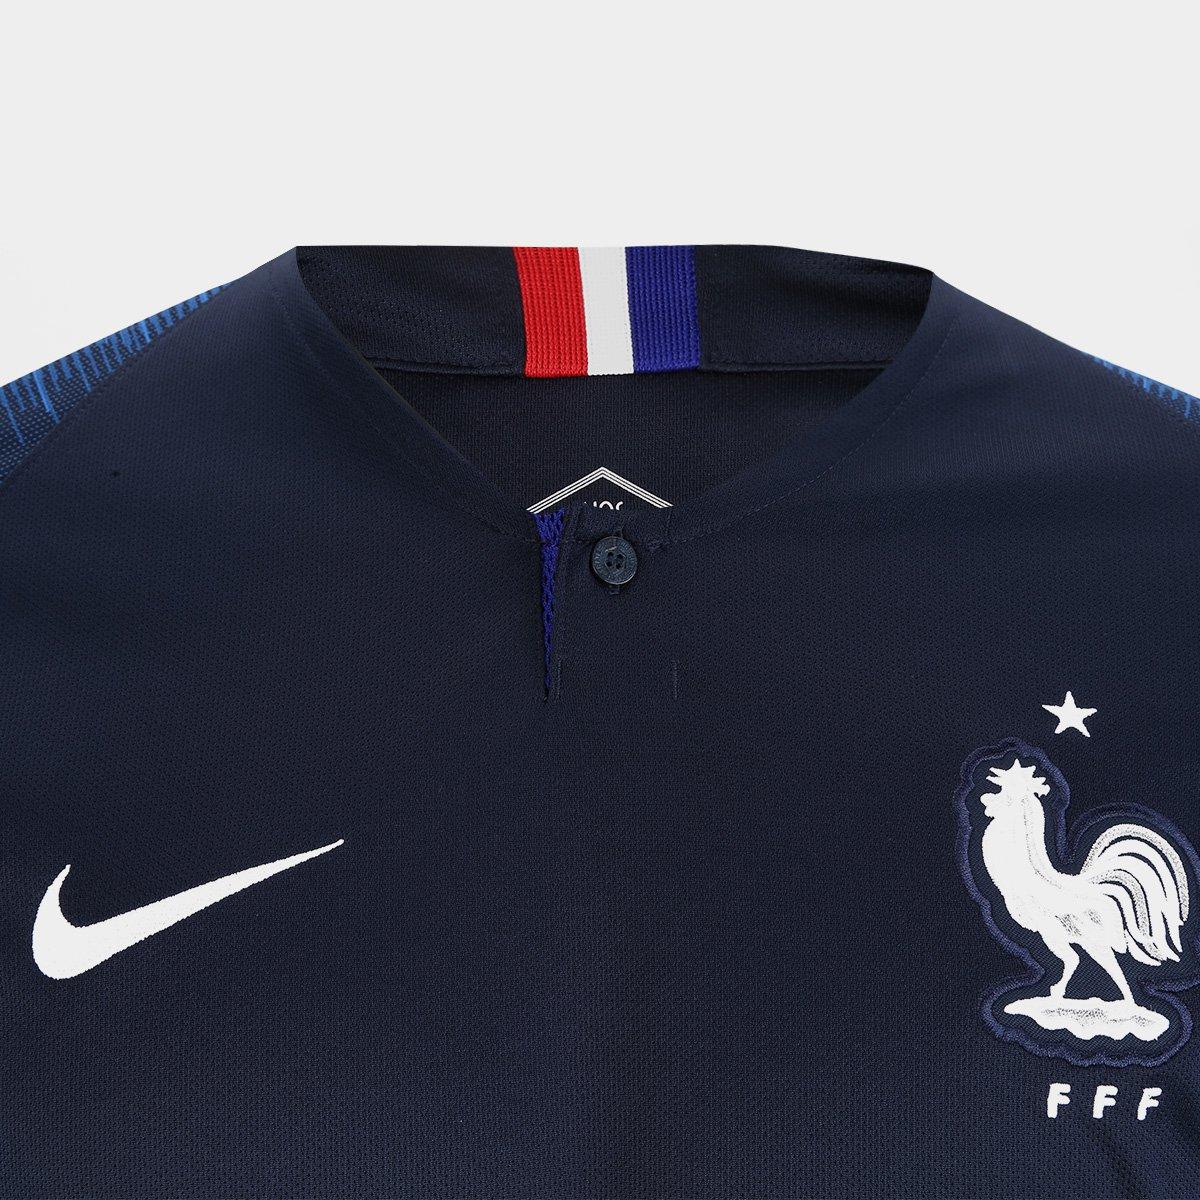 ... Camisa Seleção França Home 2018 s n° Torcedor Nike Masculina ... a2227d7f34b91